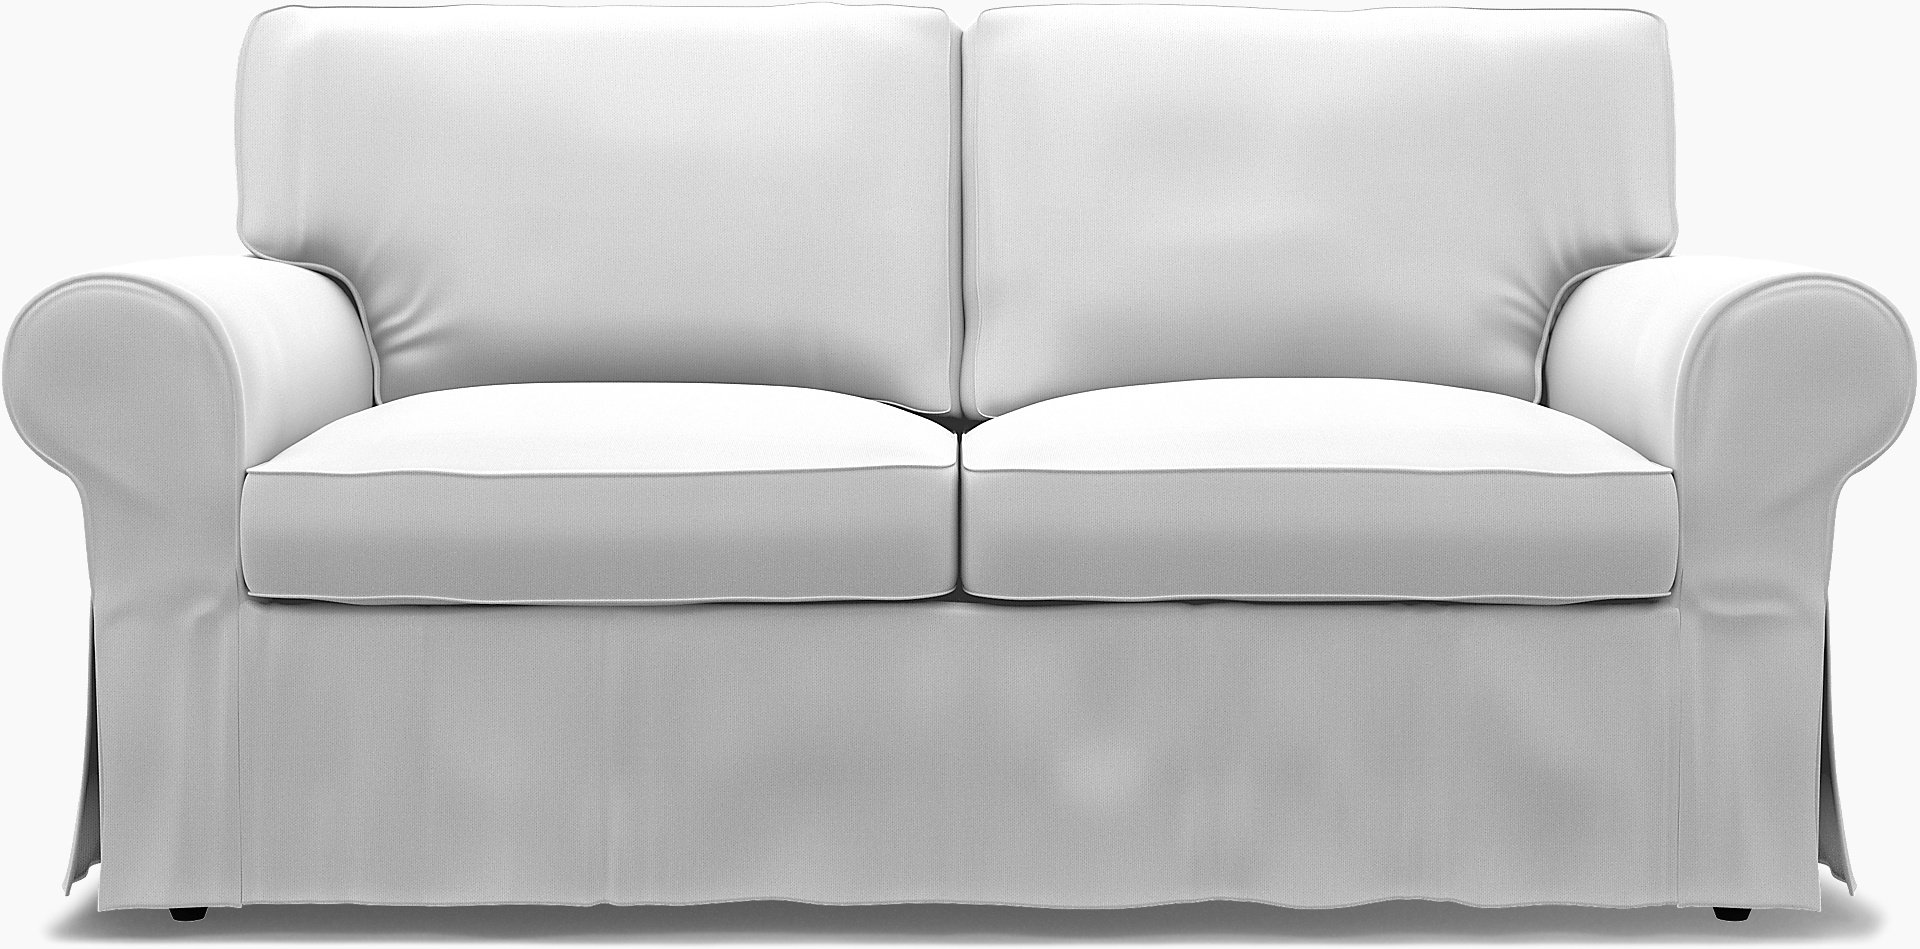 Full Size of Ikea Ektorp Sofa With Chaise Slipcover Pixbo Bed Cover Covers 3 Seat Uk Assembly Instructions Review Bezug Fr 2er Xxl U Form Ausziehbar Xxxl Bora Polster Stoff Sofa Ektorp Sofa